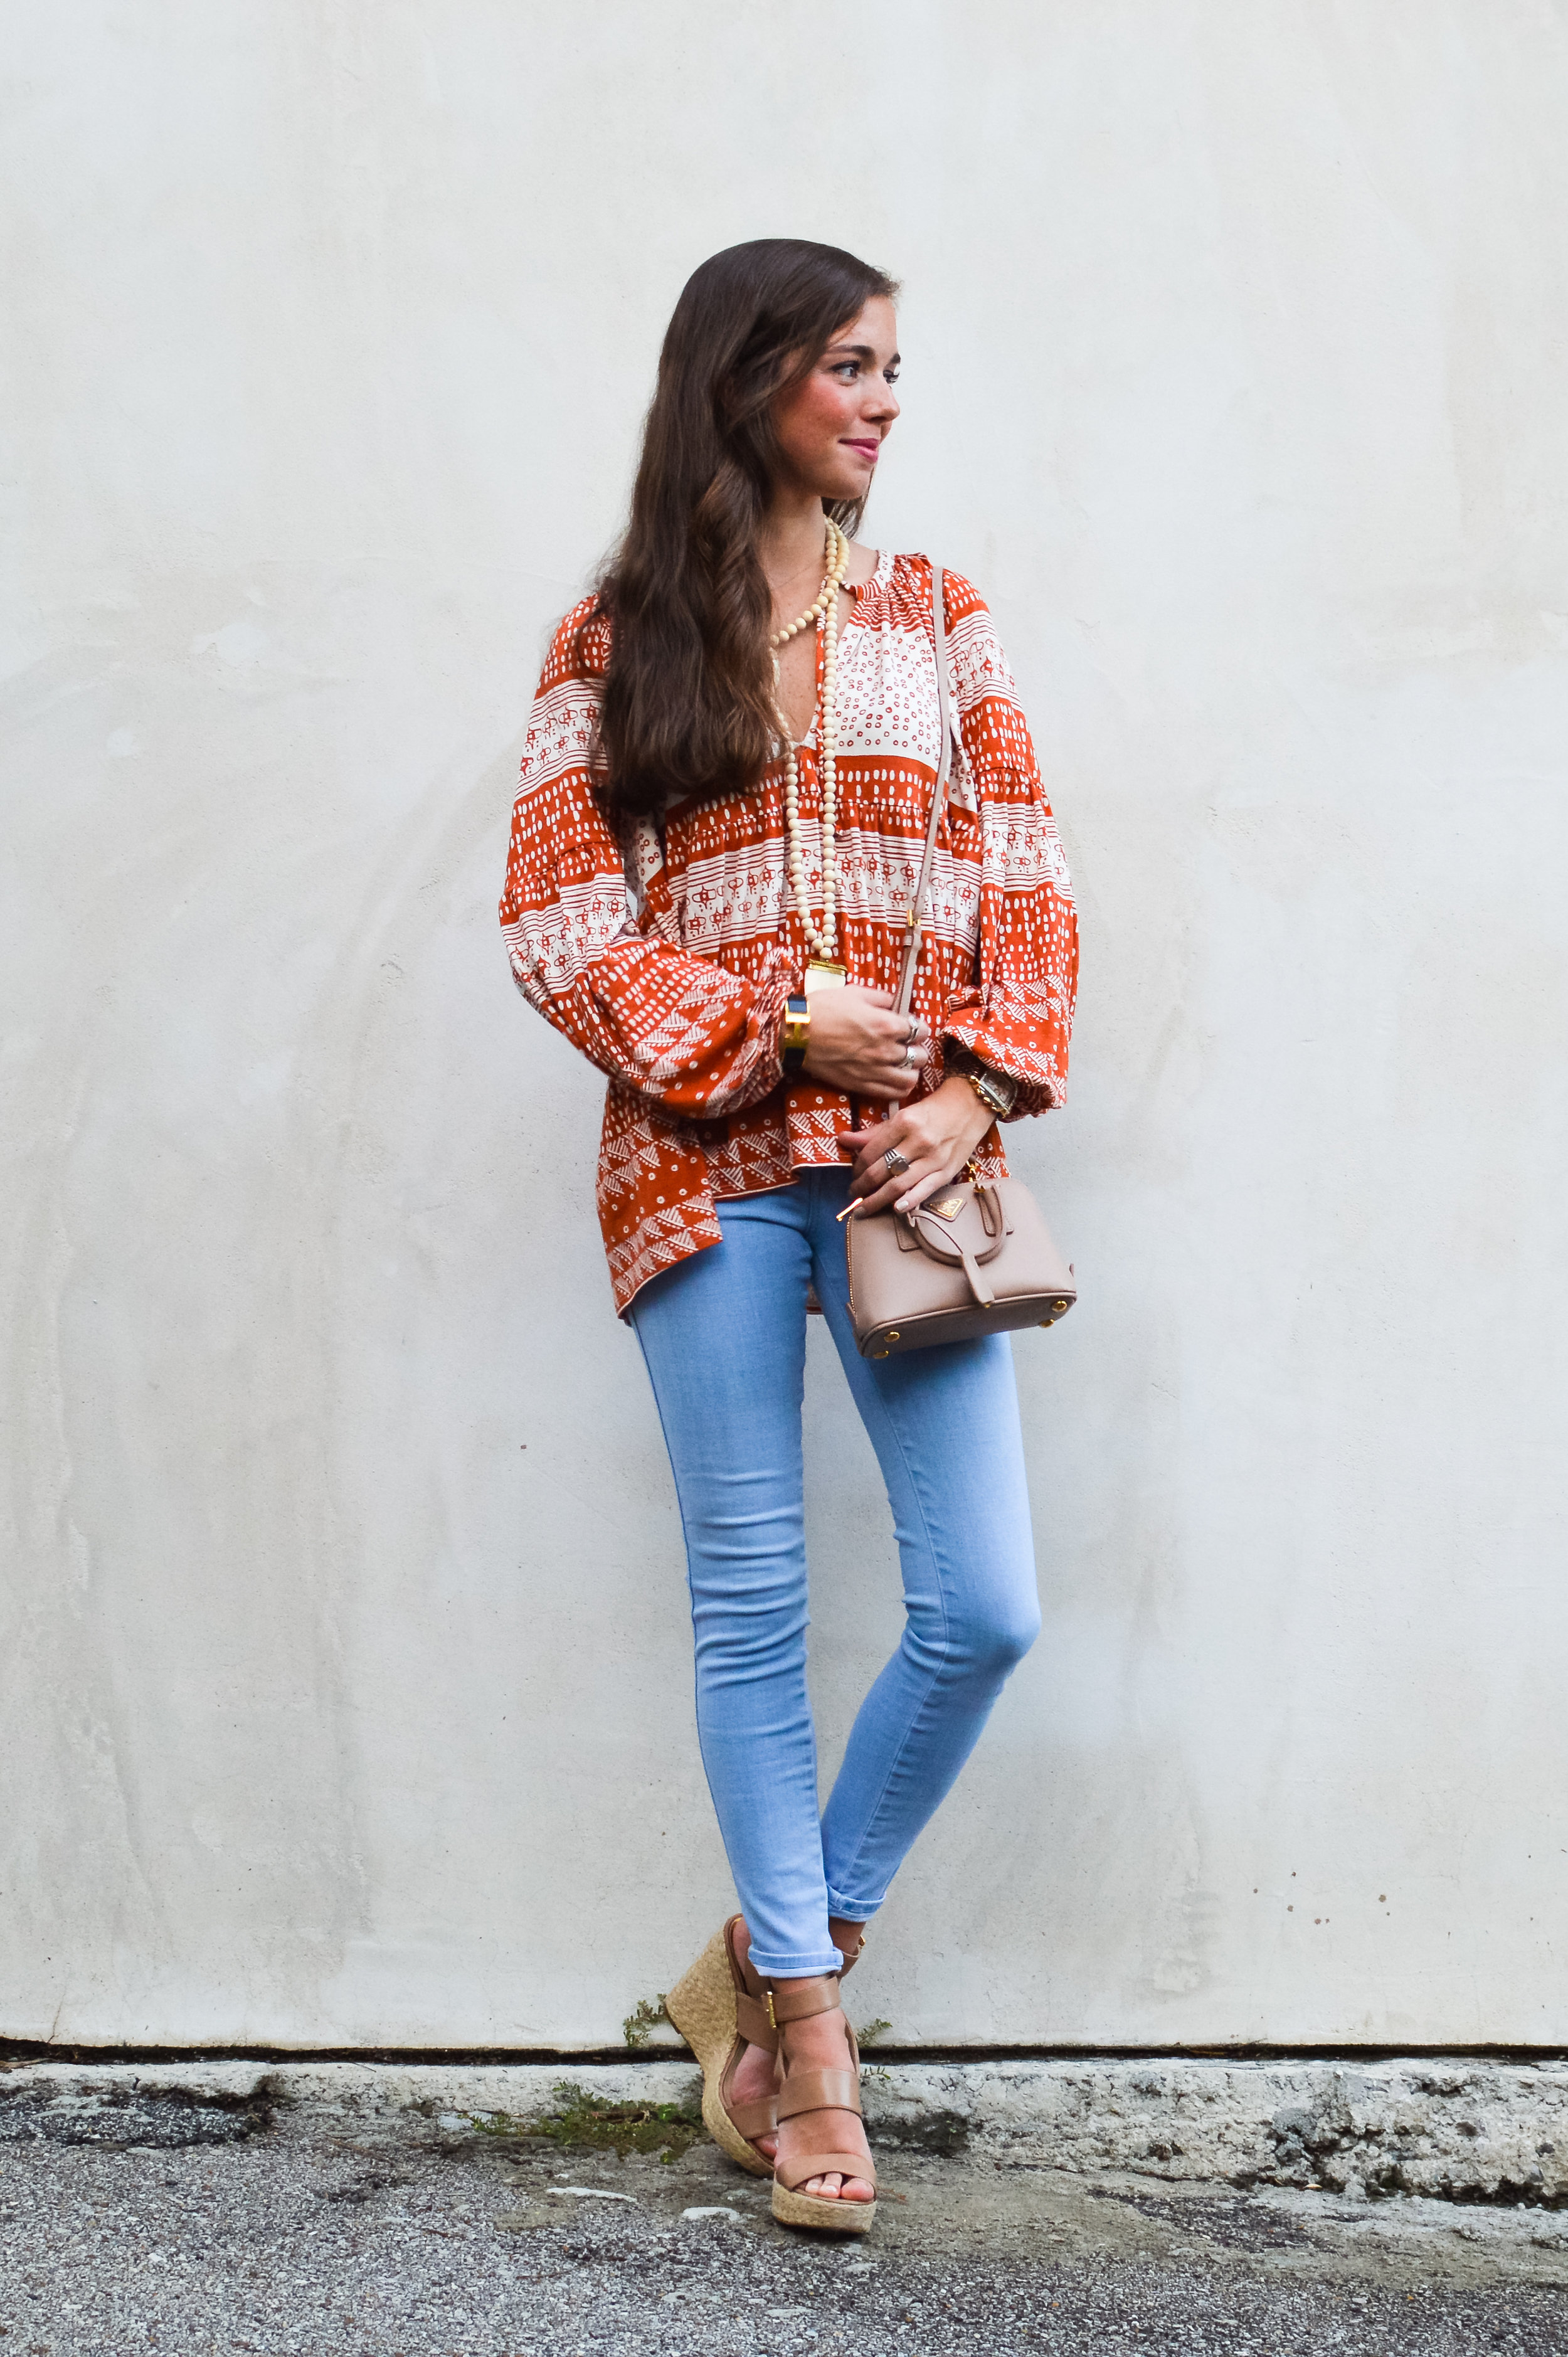 fashion blogger lcb style rachel pally (4 of 18).jpg